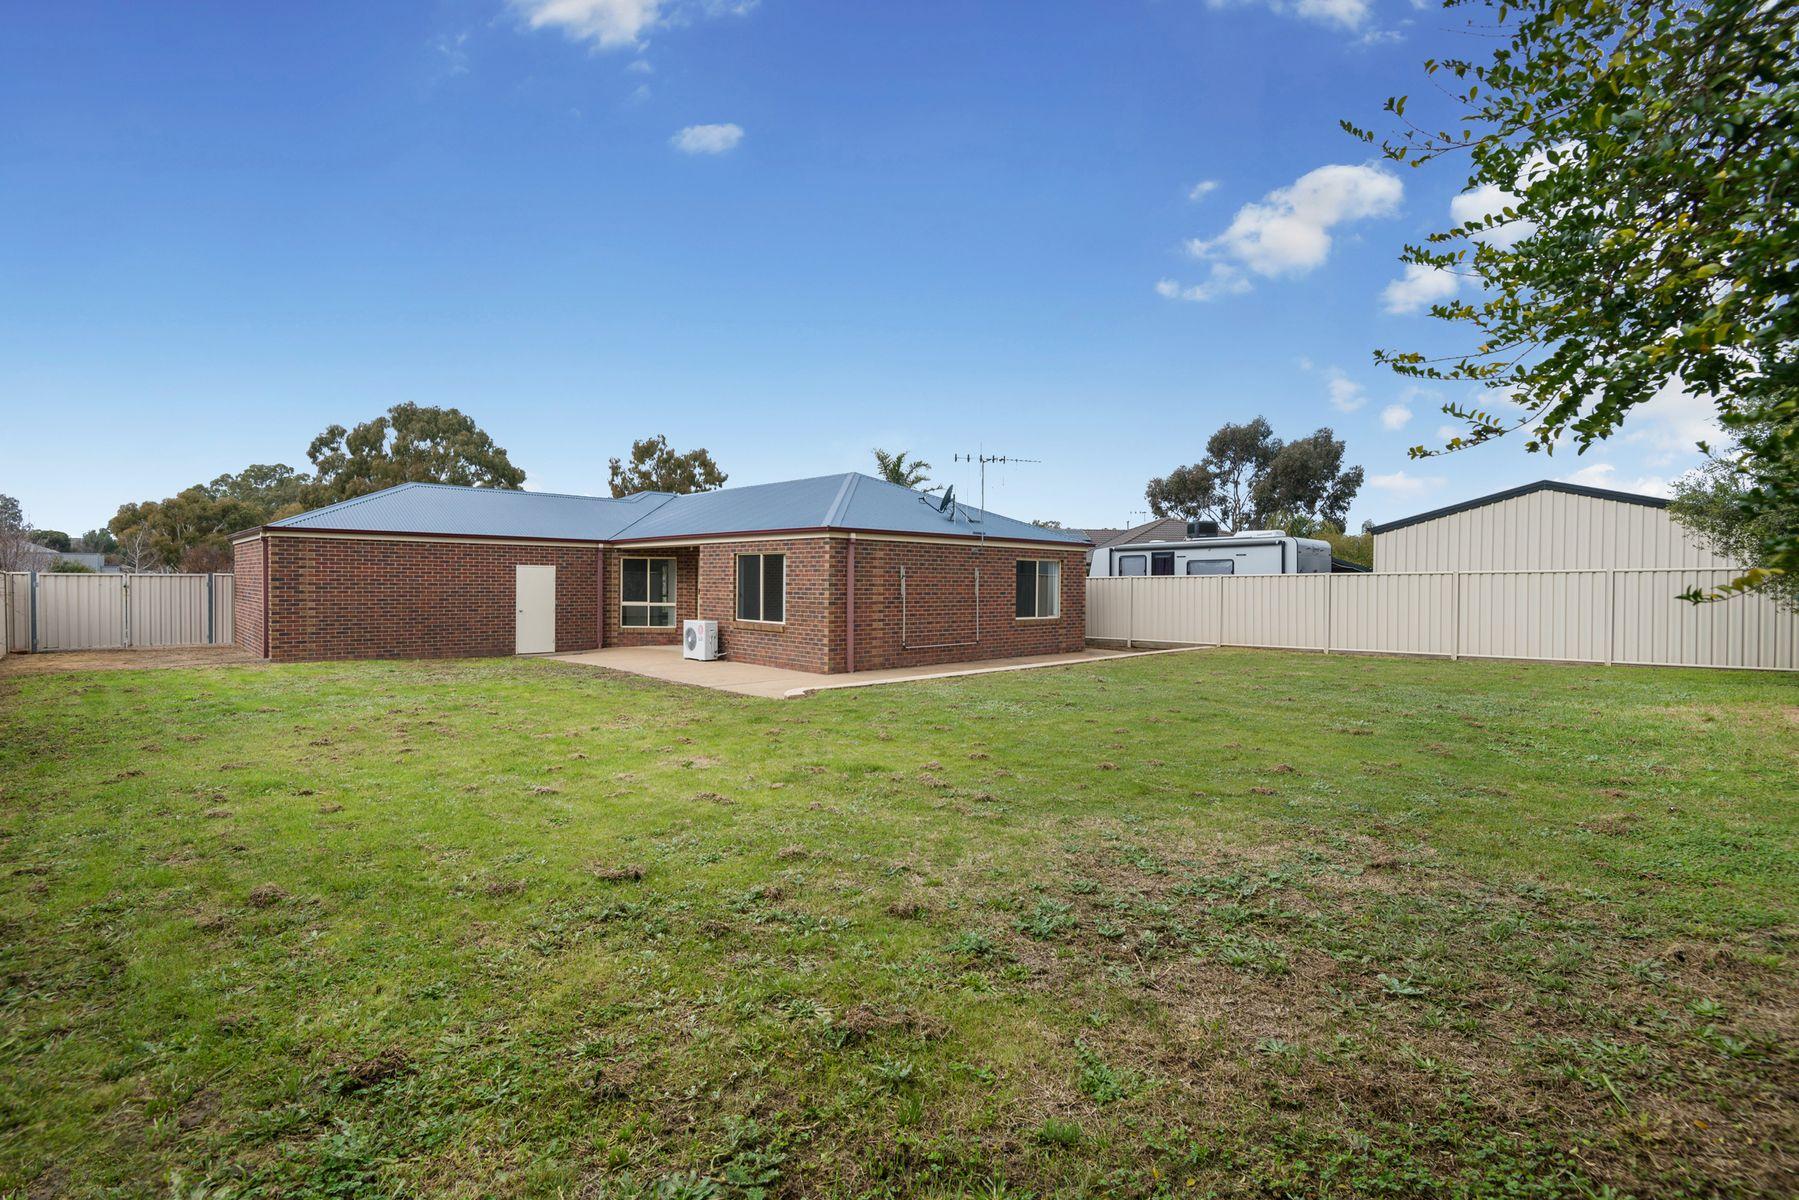 9 Alexander Close, Strathfieldsaye, VIC 3551